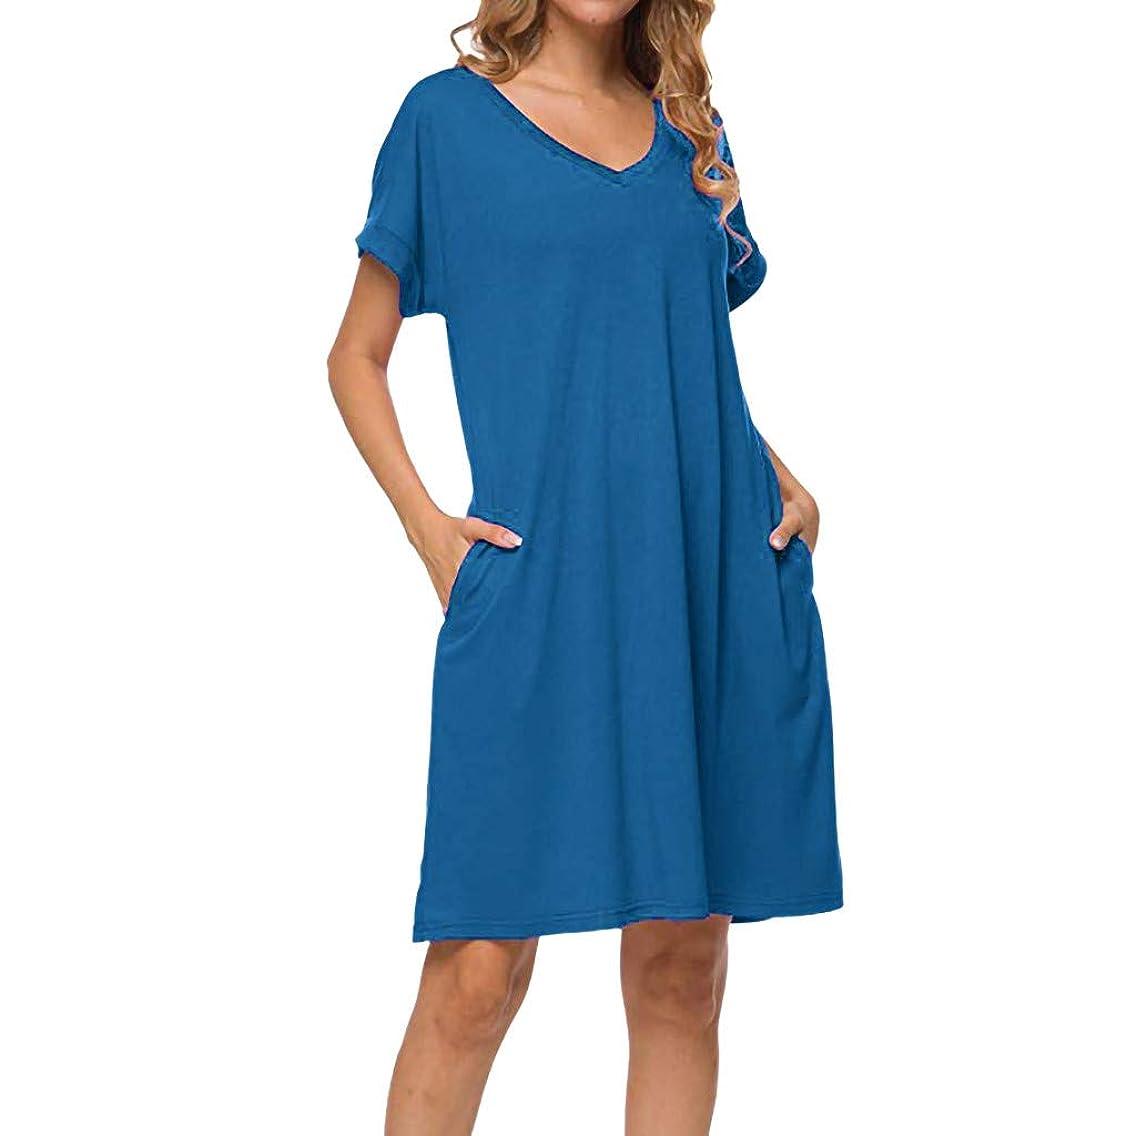 Tantisy ??? Women's V-Neck and O-Neck Cotton Casual Dress Short Sleeve Basic Plain Summer Ladies Dresses